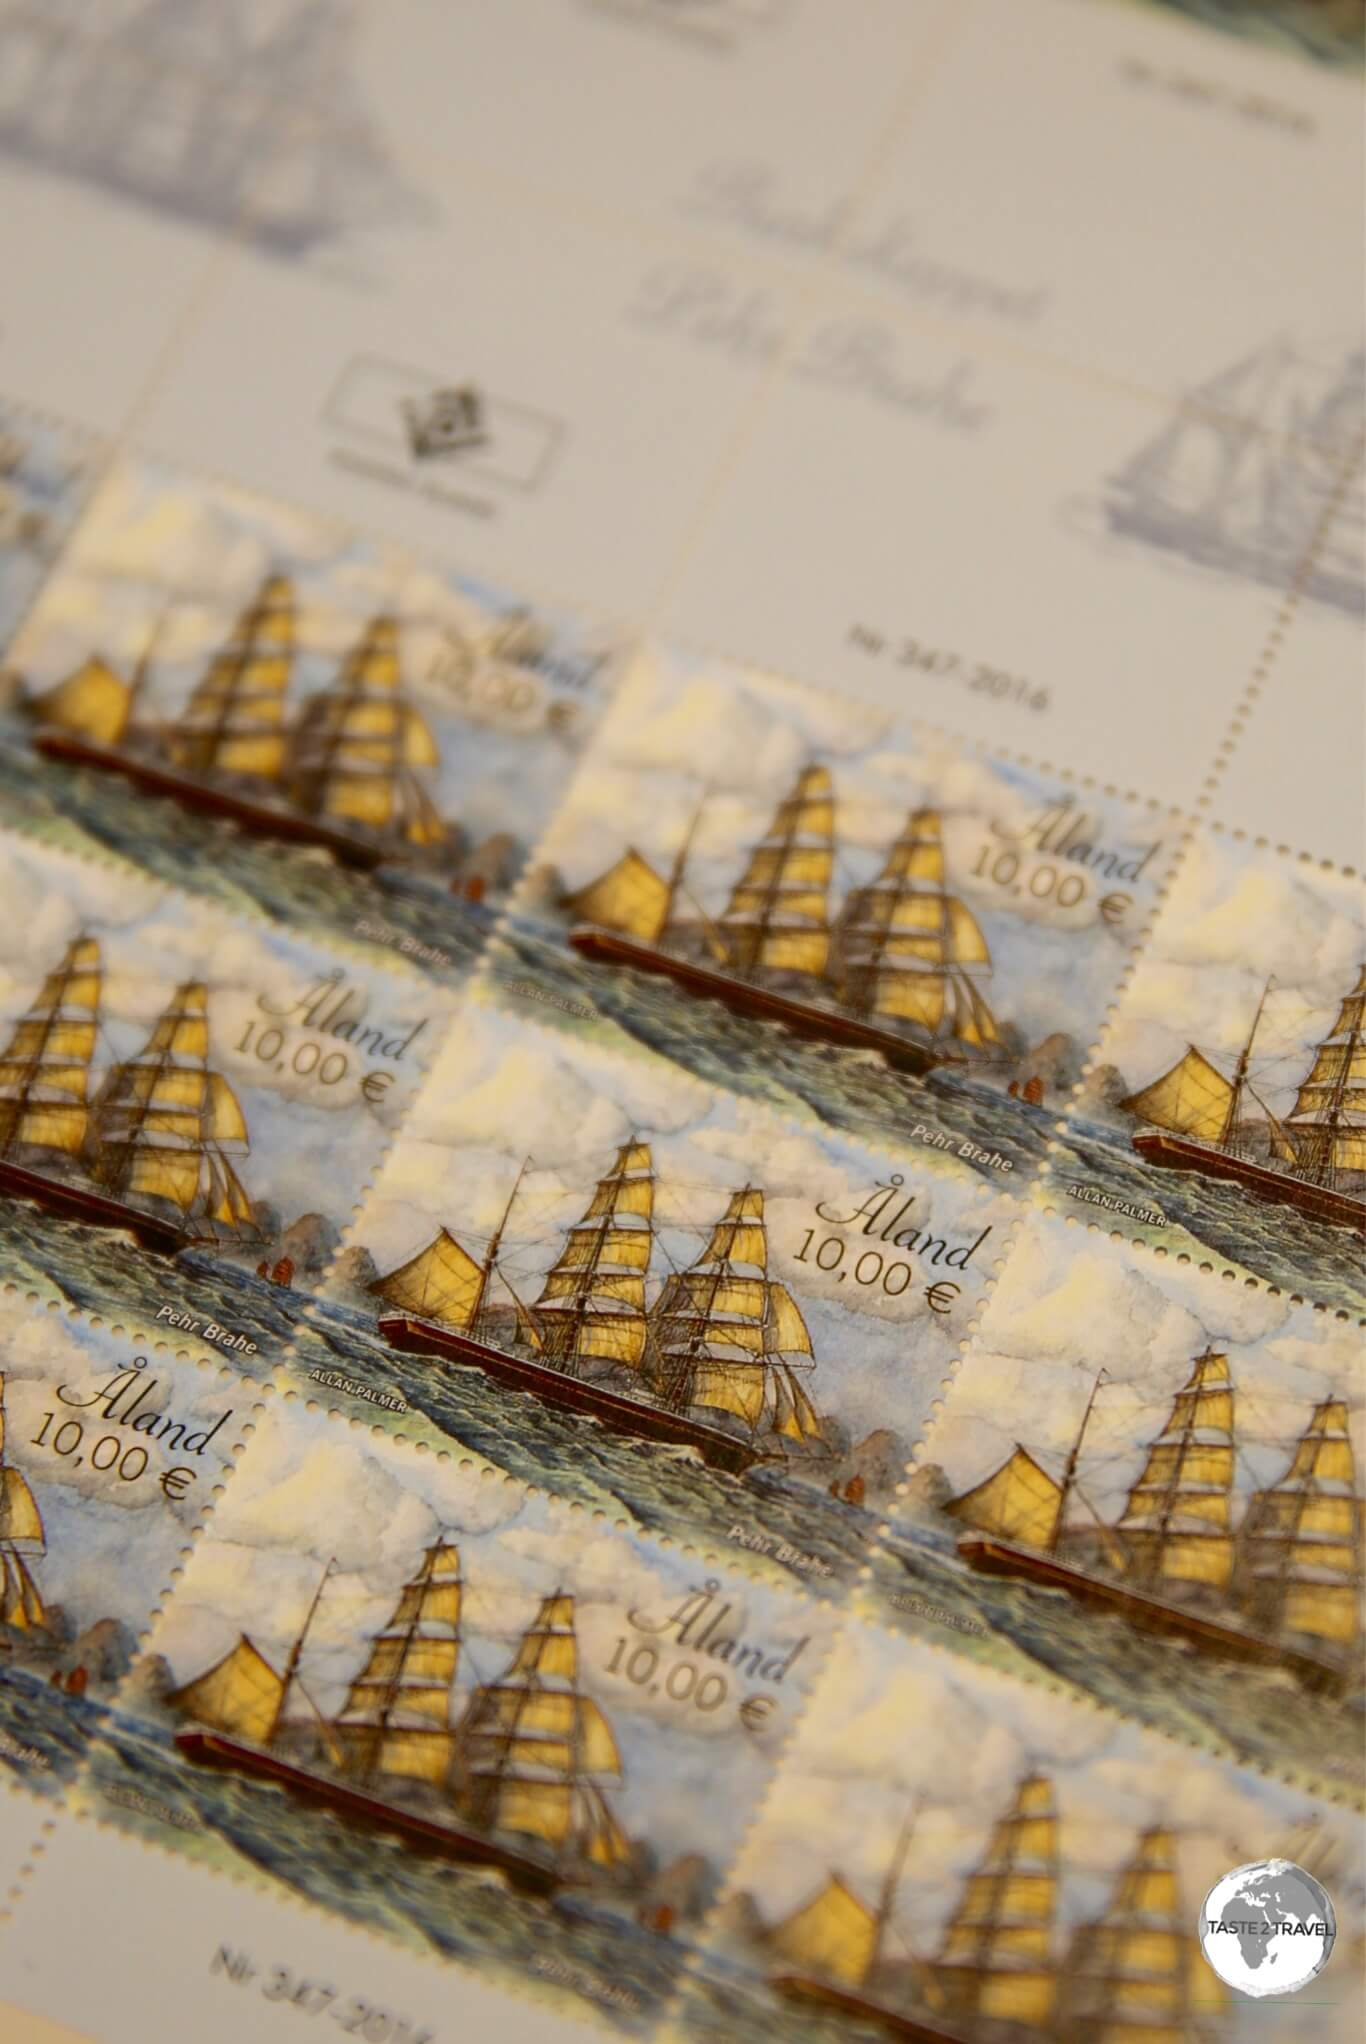 Aland Island stamps.